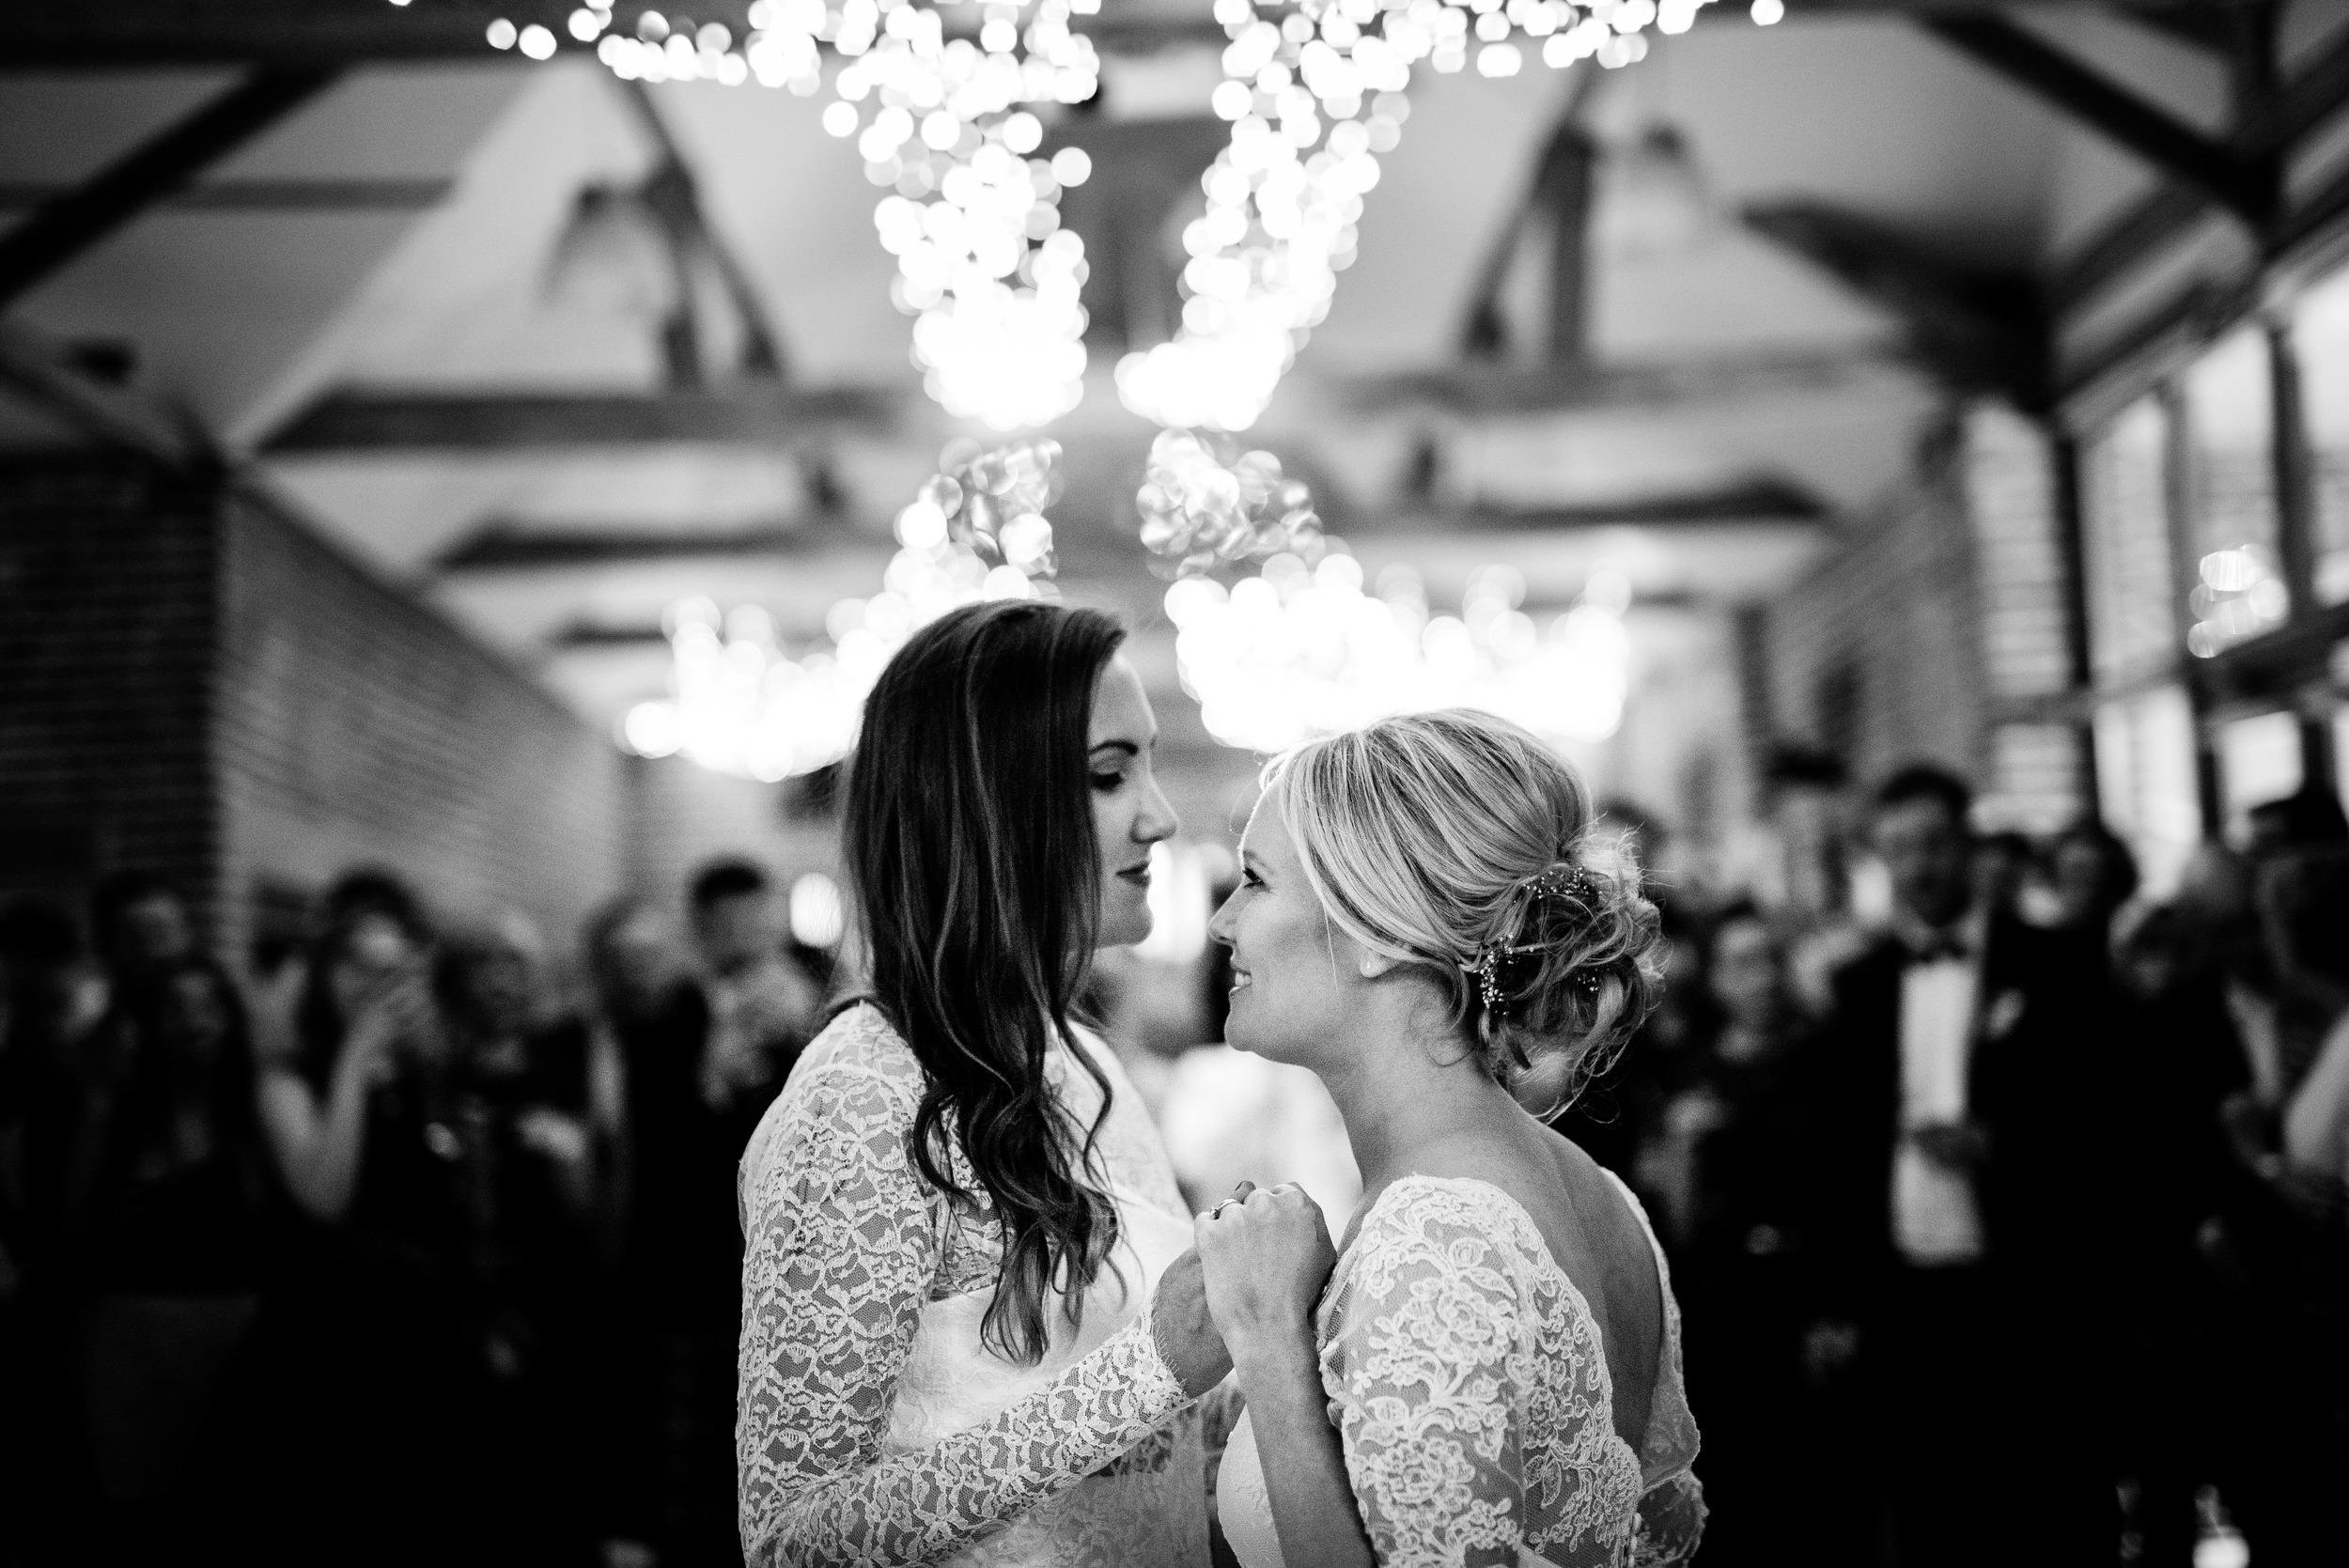 Wasing Park Wedding Photography - Emma & Sarah-362.jpg